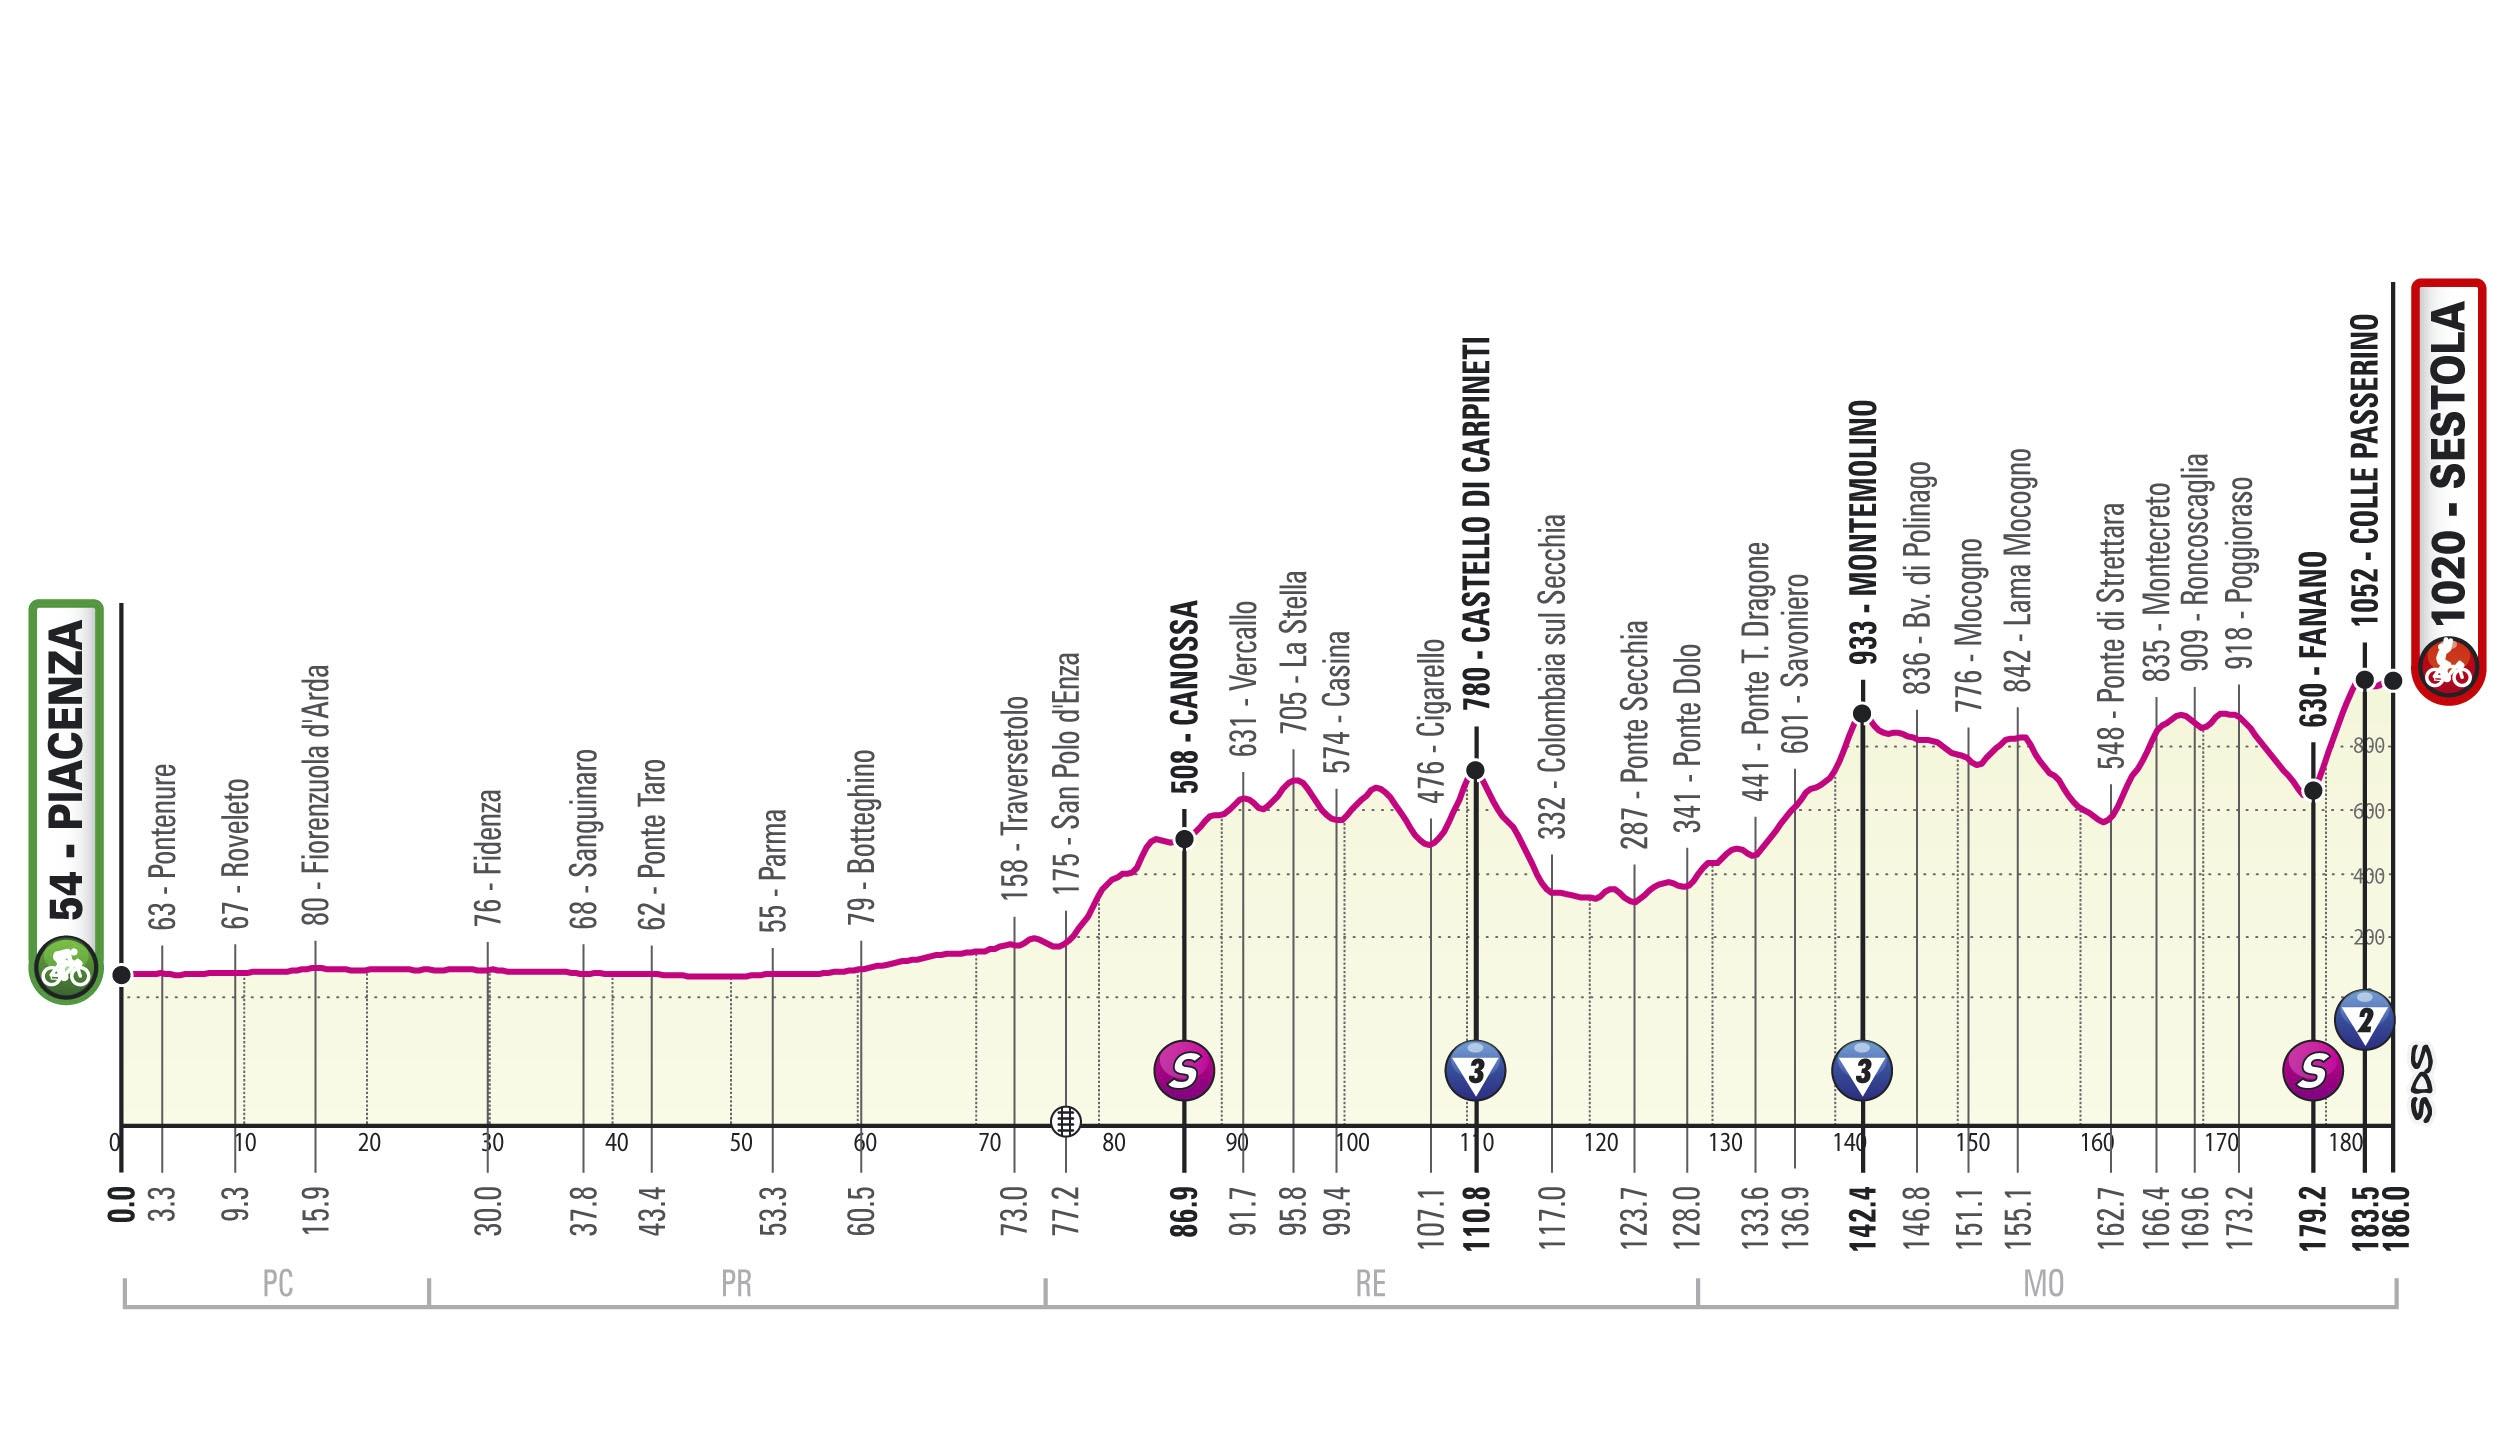 Rit 4 Giro d'Italia 2021